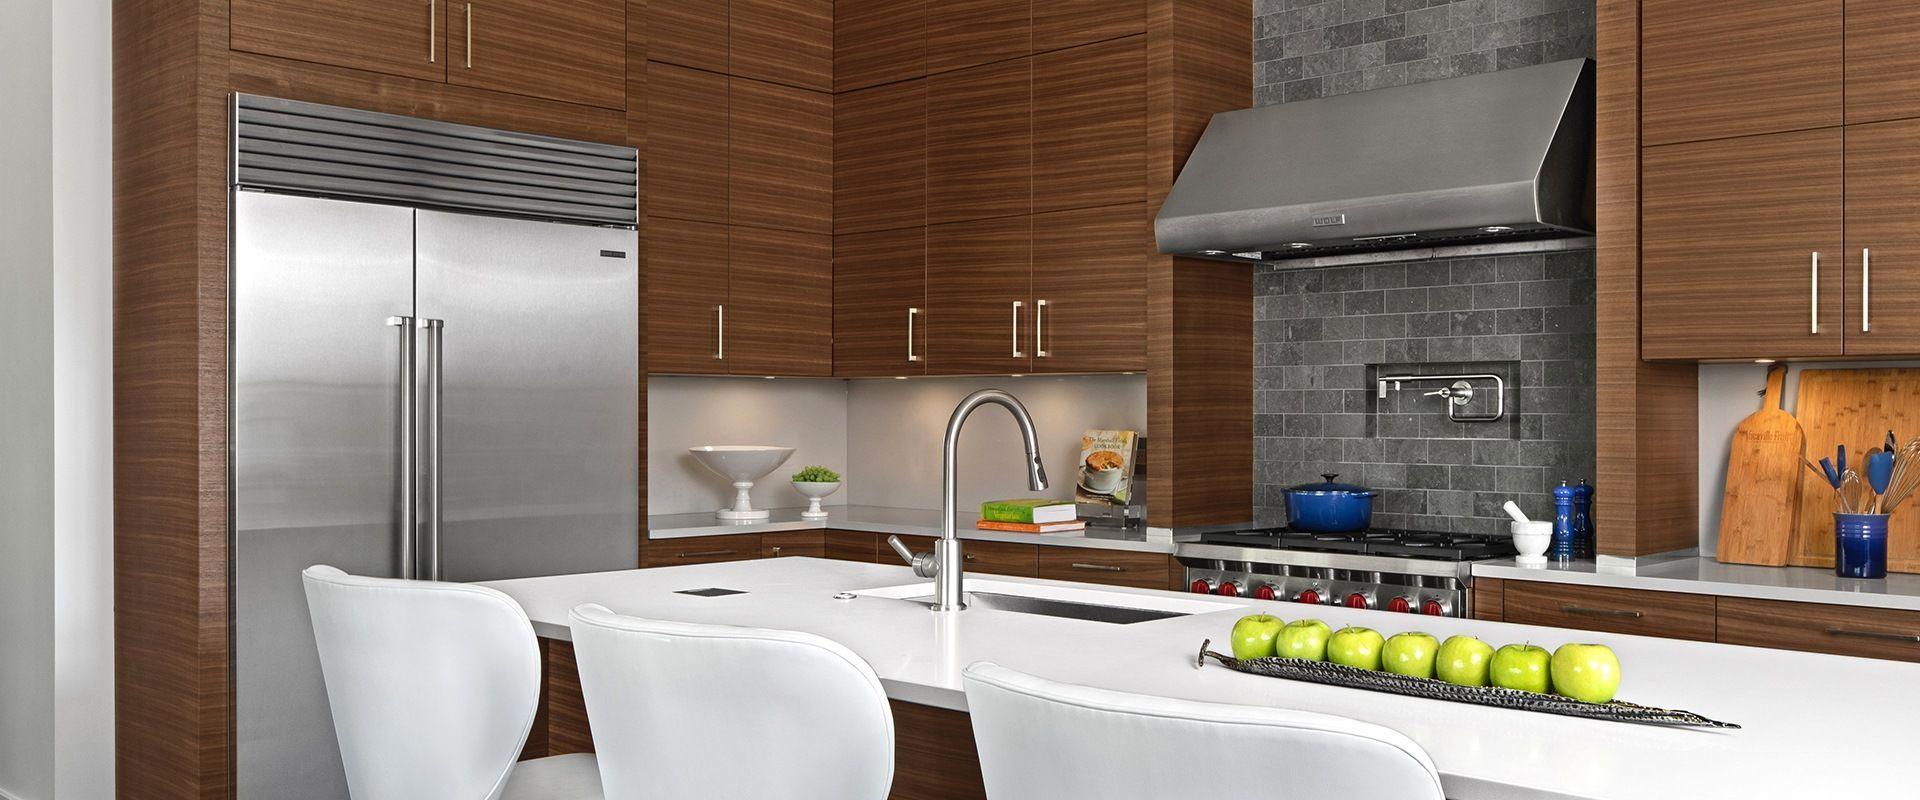 Contemporary Walnut Grabill Cabinets